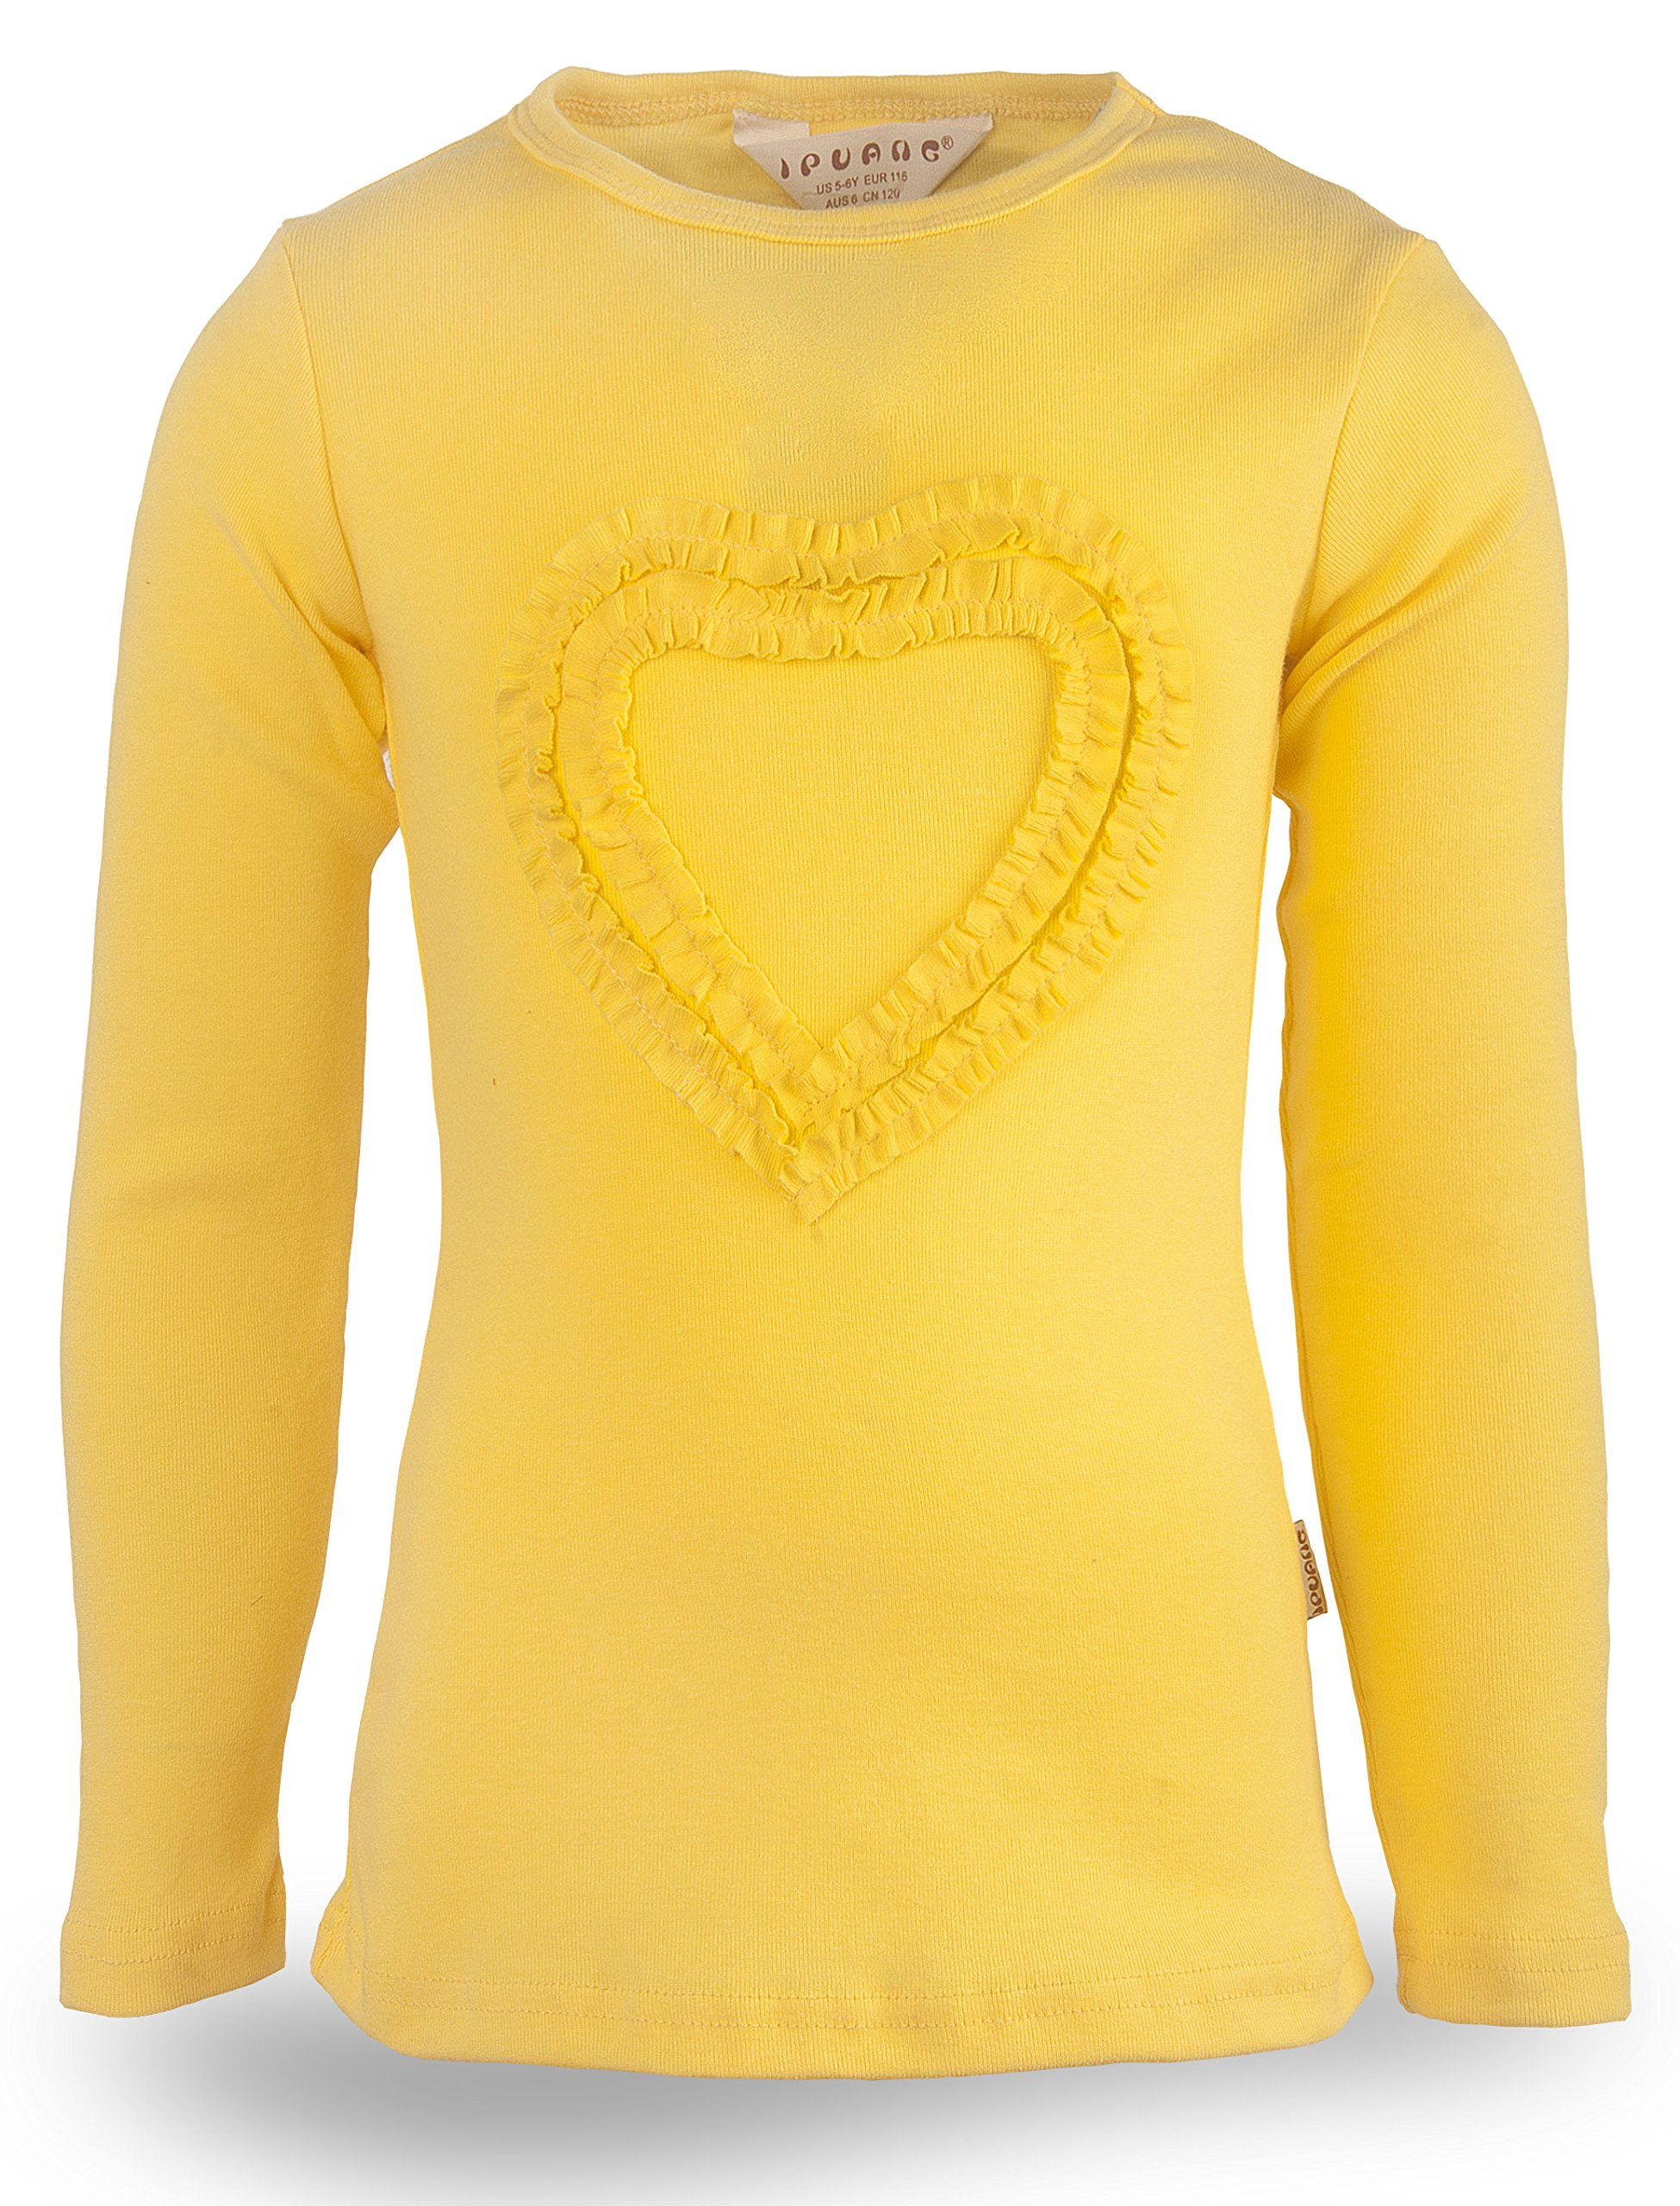 e89f0cfe Ipuang Little Girls' Heart-Shaped Long Sleeve T-Shirt 4 Yellow